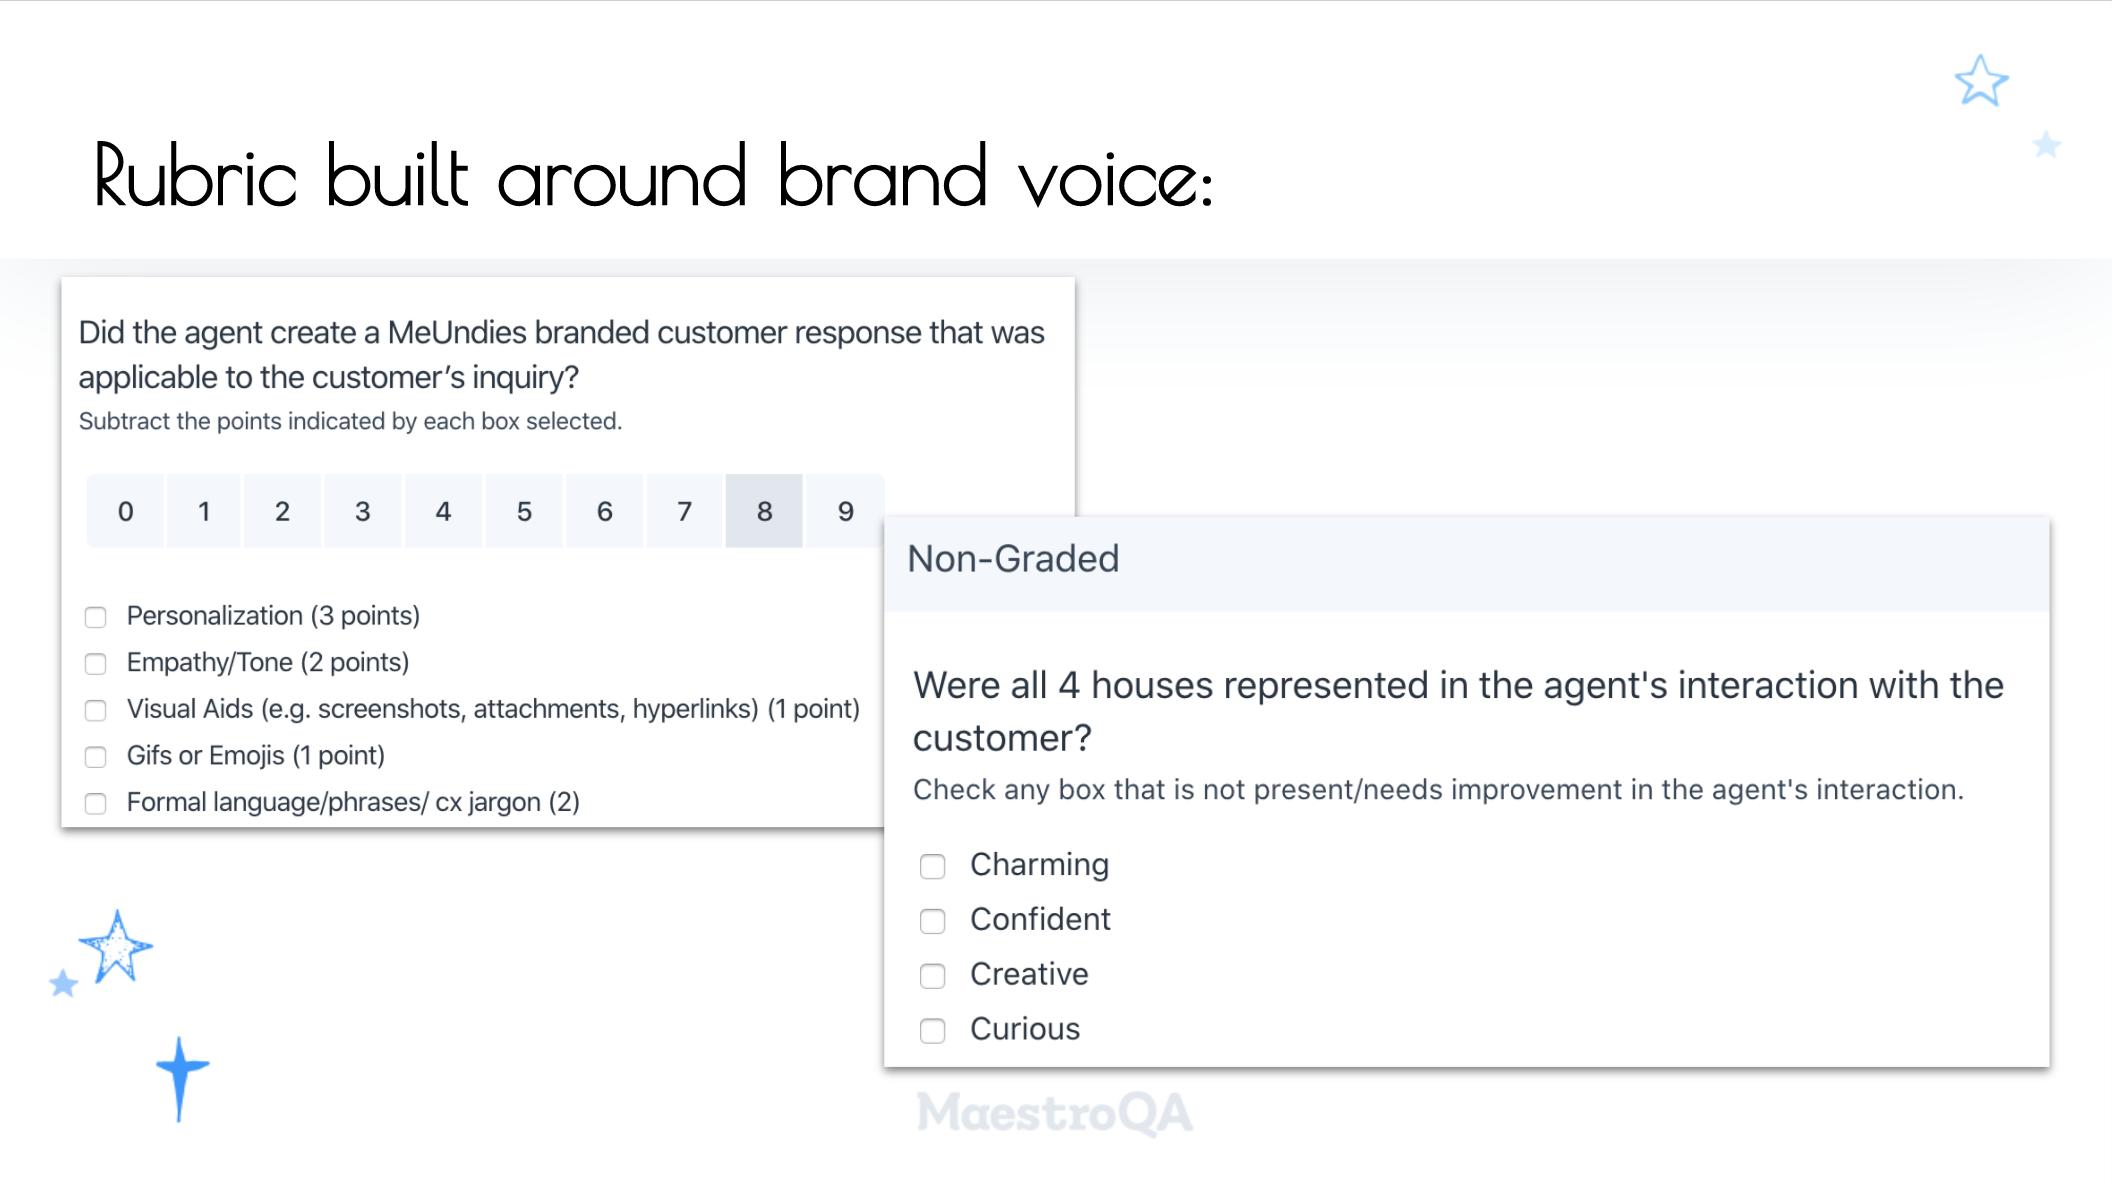 Slide showing MeUndies' Quality Assurance scorecard or rubric.